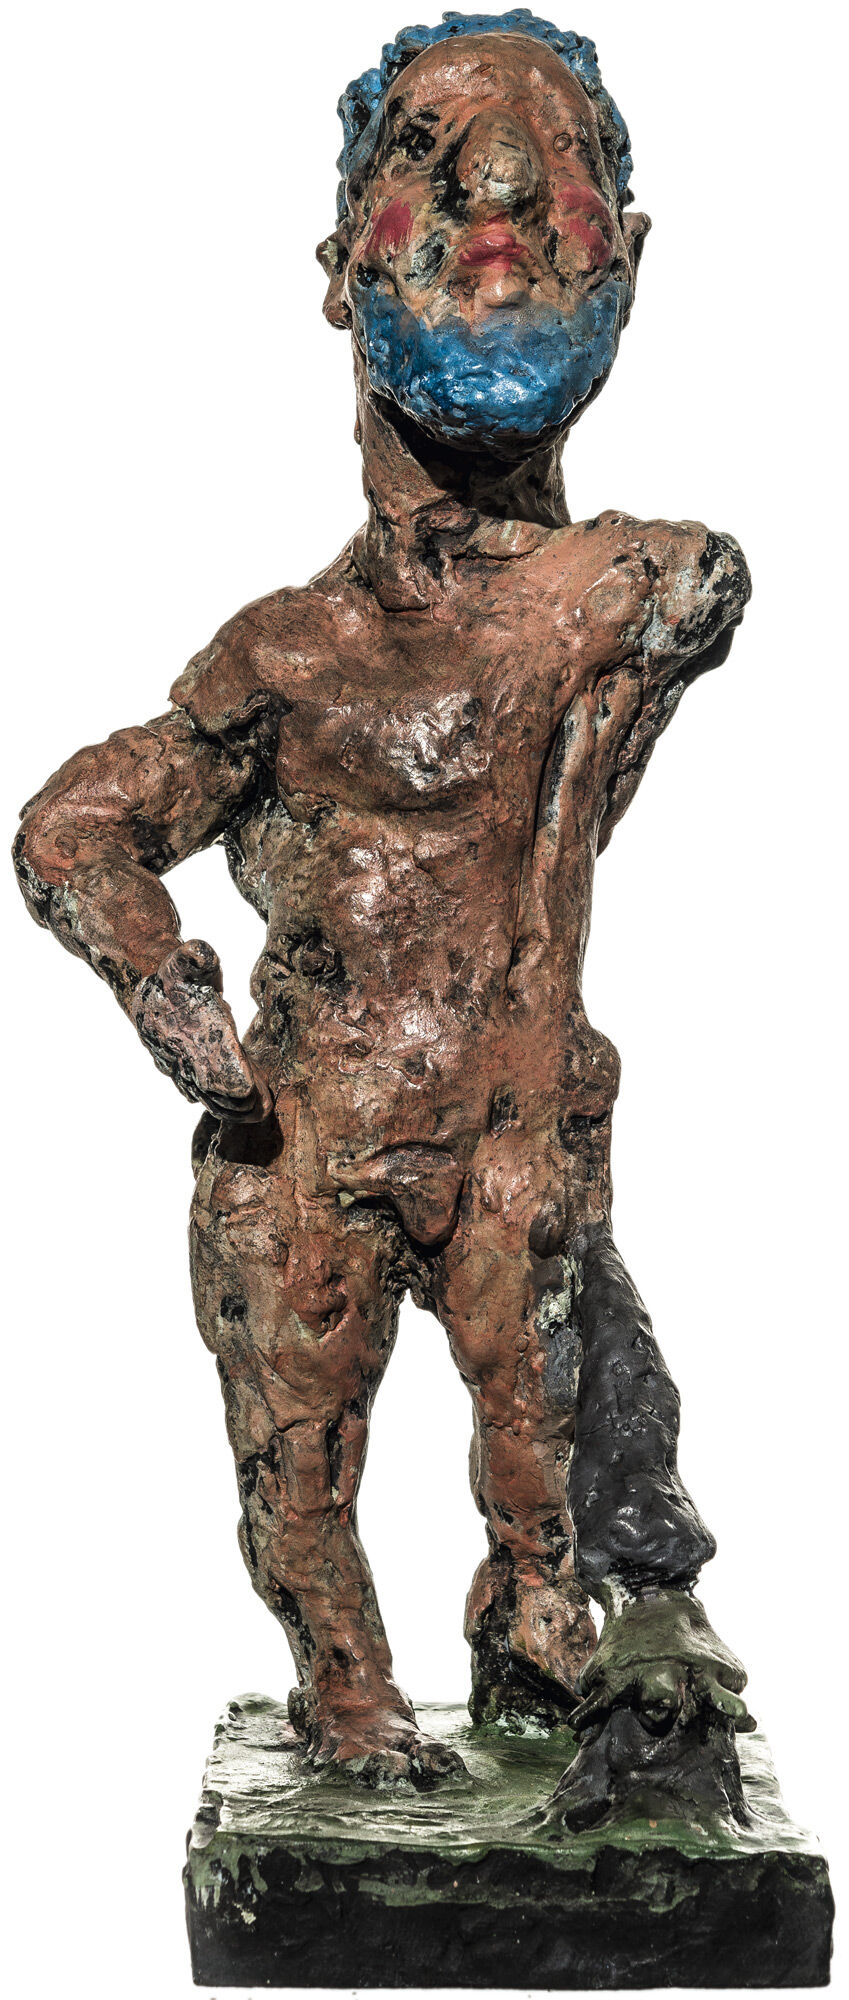 Markus lüpertz sculpture quot hercules  ars mundi english version